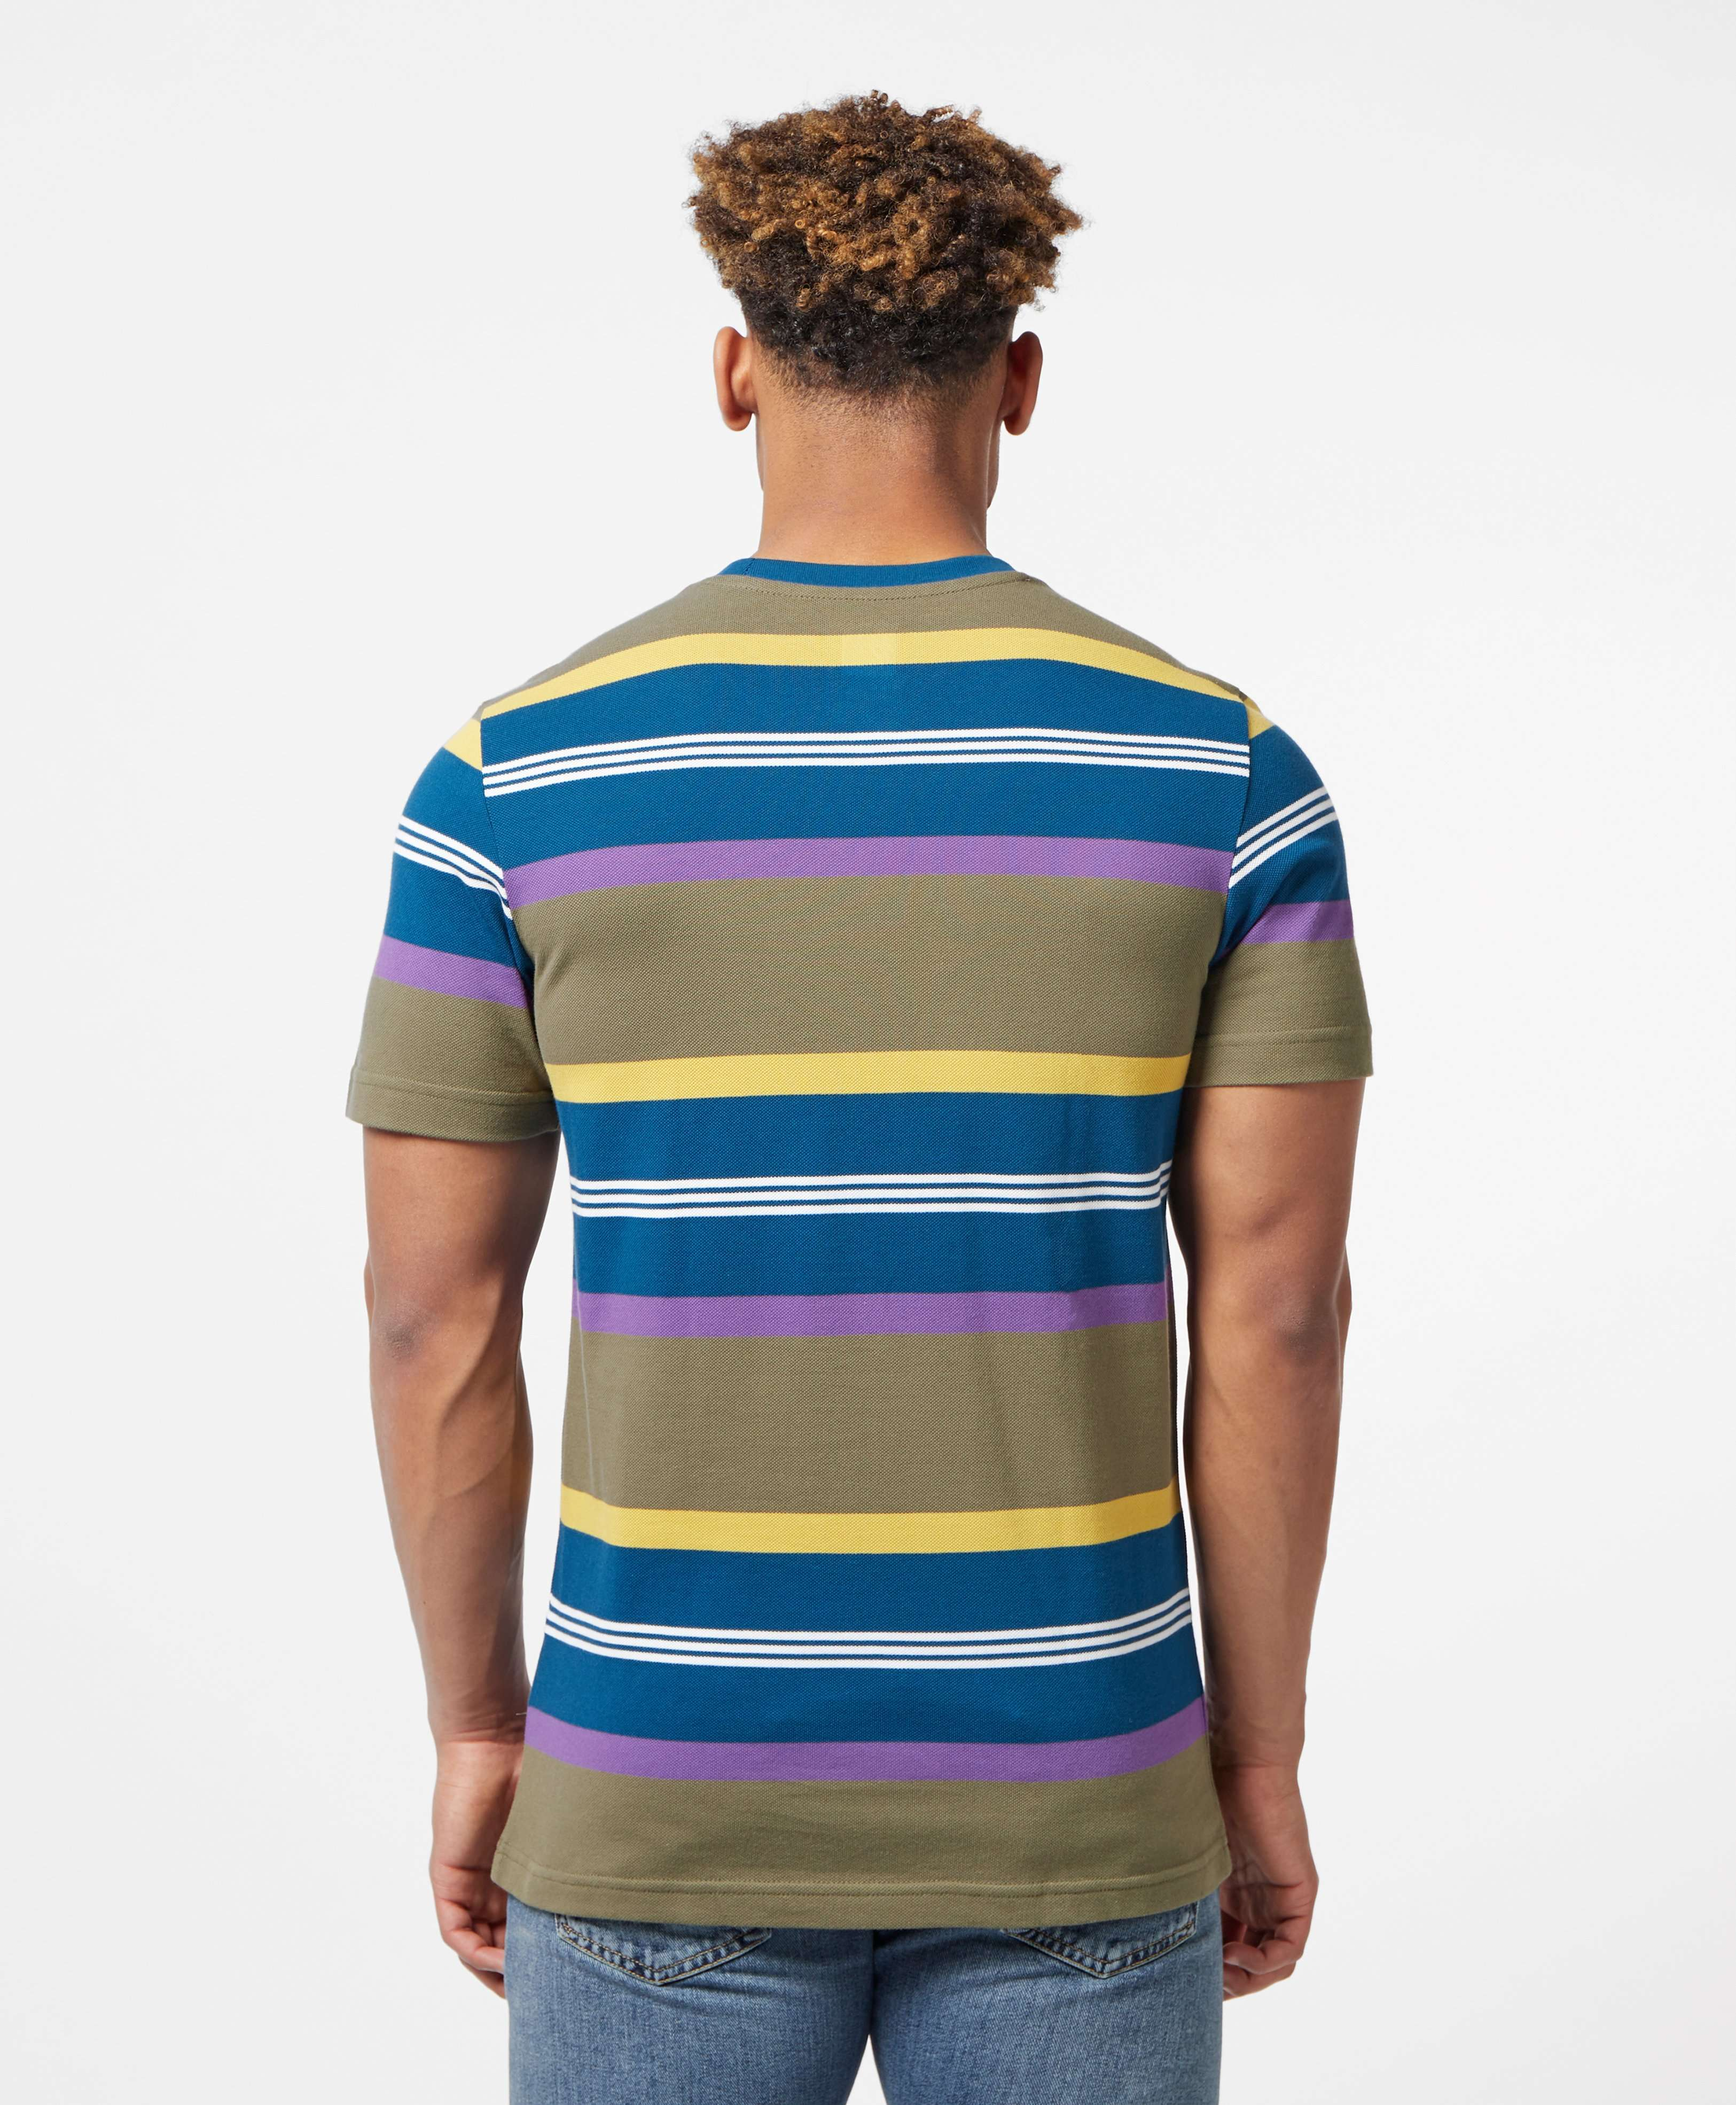 adidas Originals Pique Stripe Short Sleeve T-Shirt